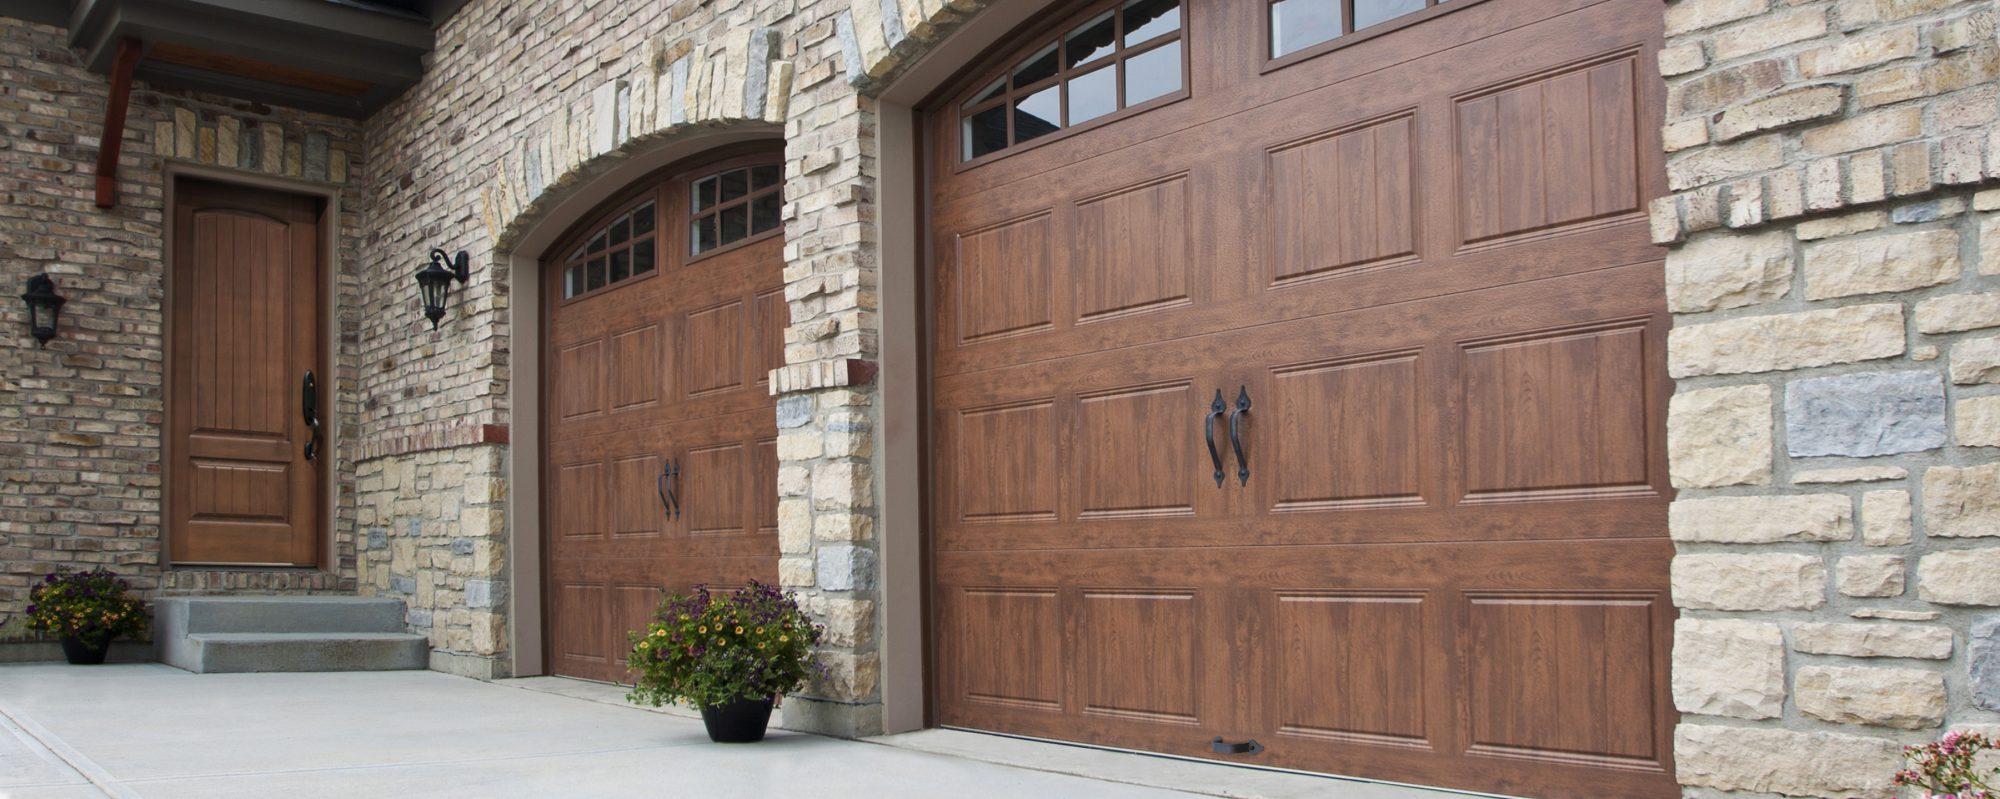 Garage Door Repair Whitby Local Toronto Business